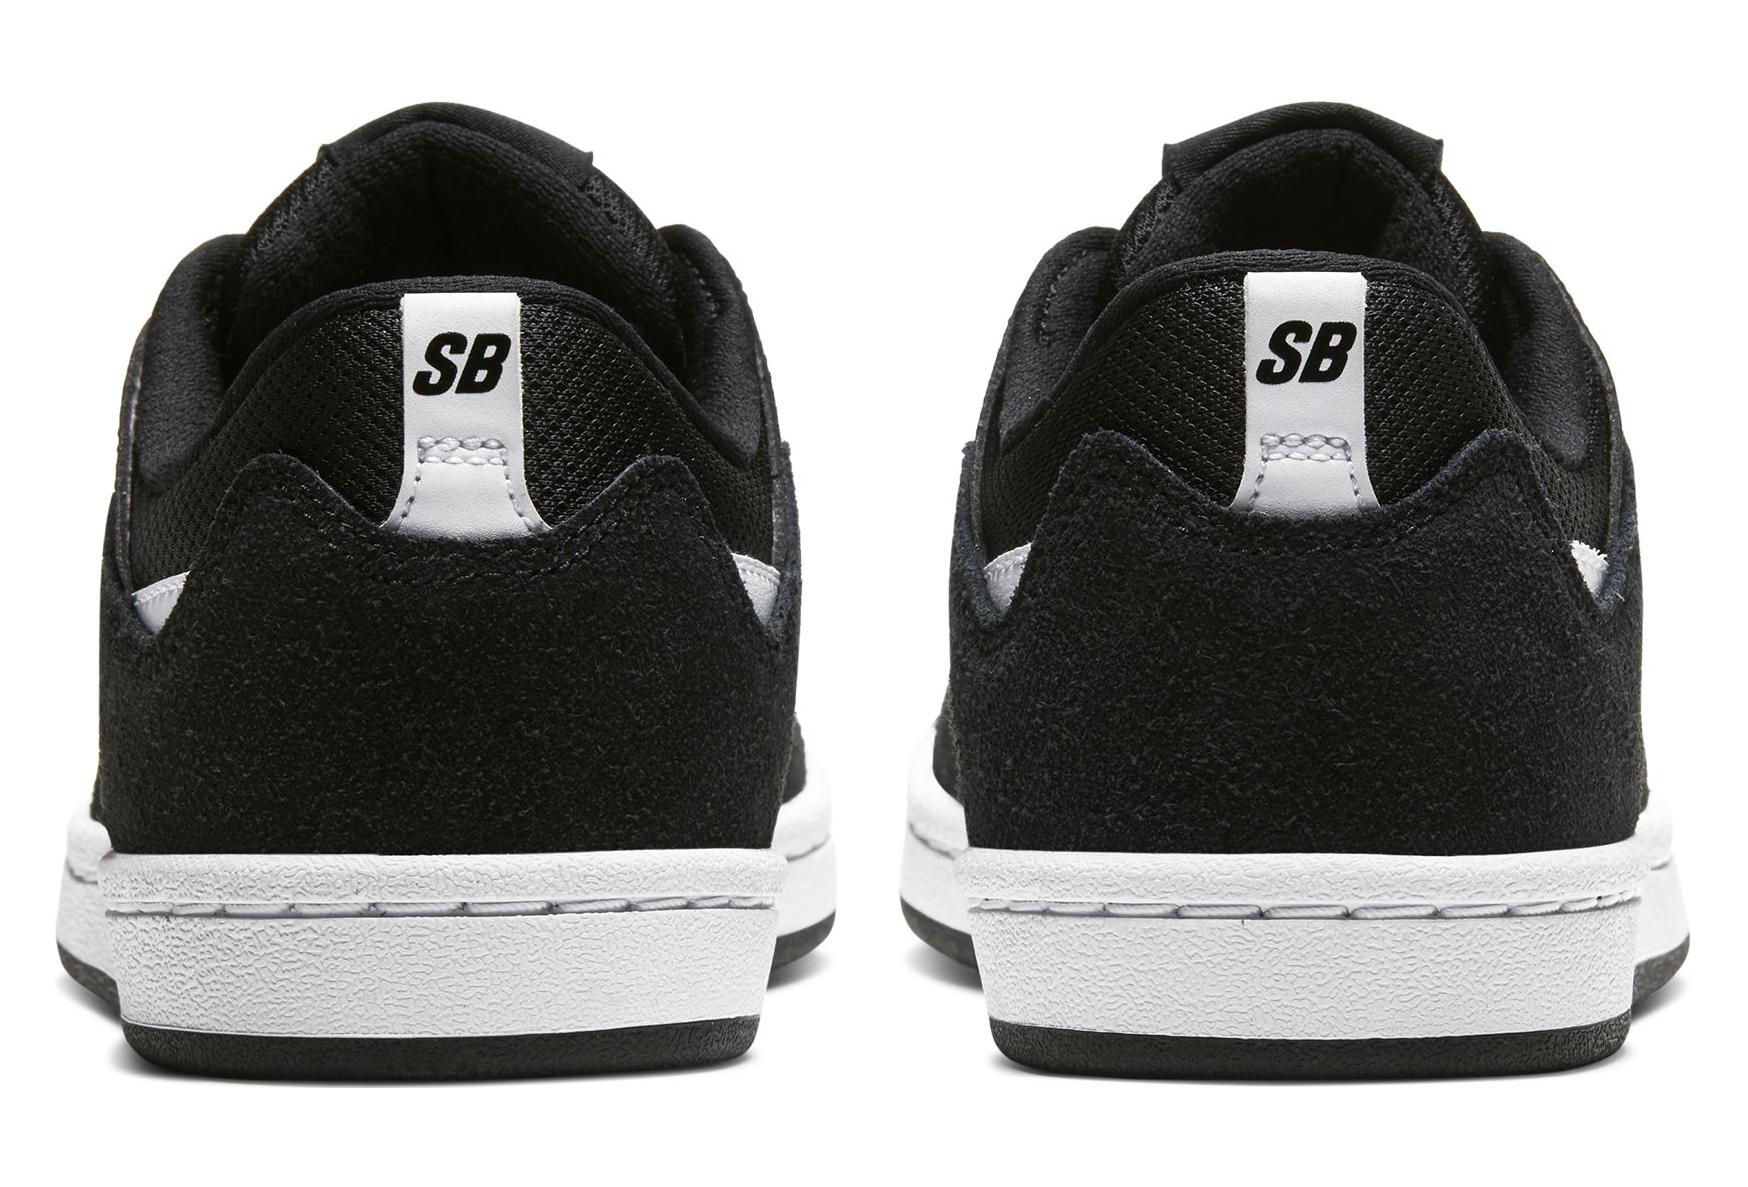 Nike SB Alleyoop Black / White Kids Shoes   Alltricks.com